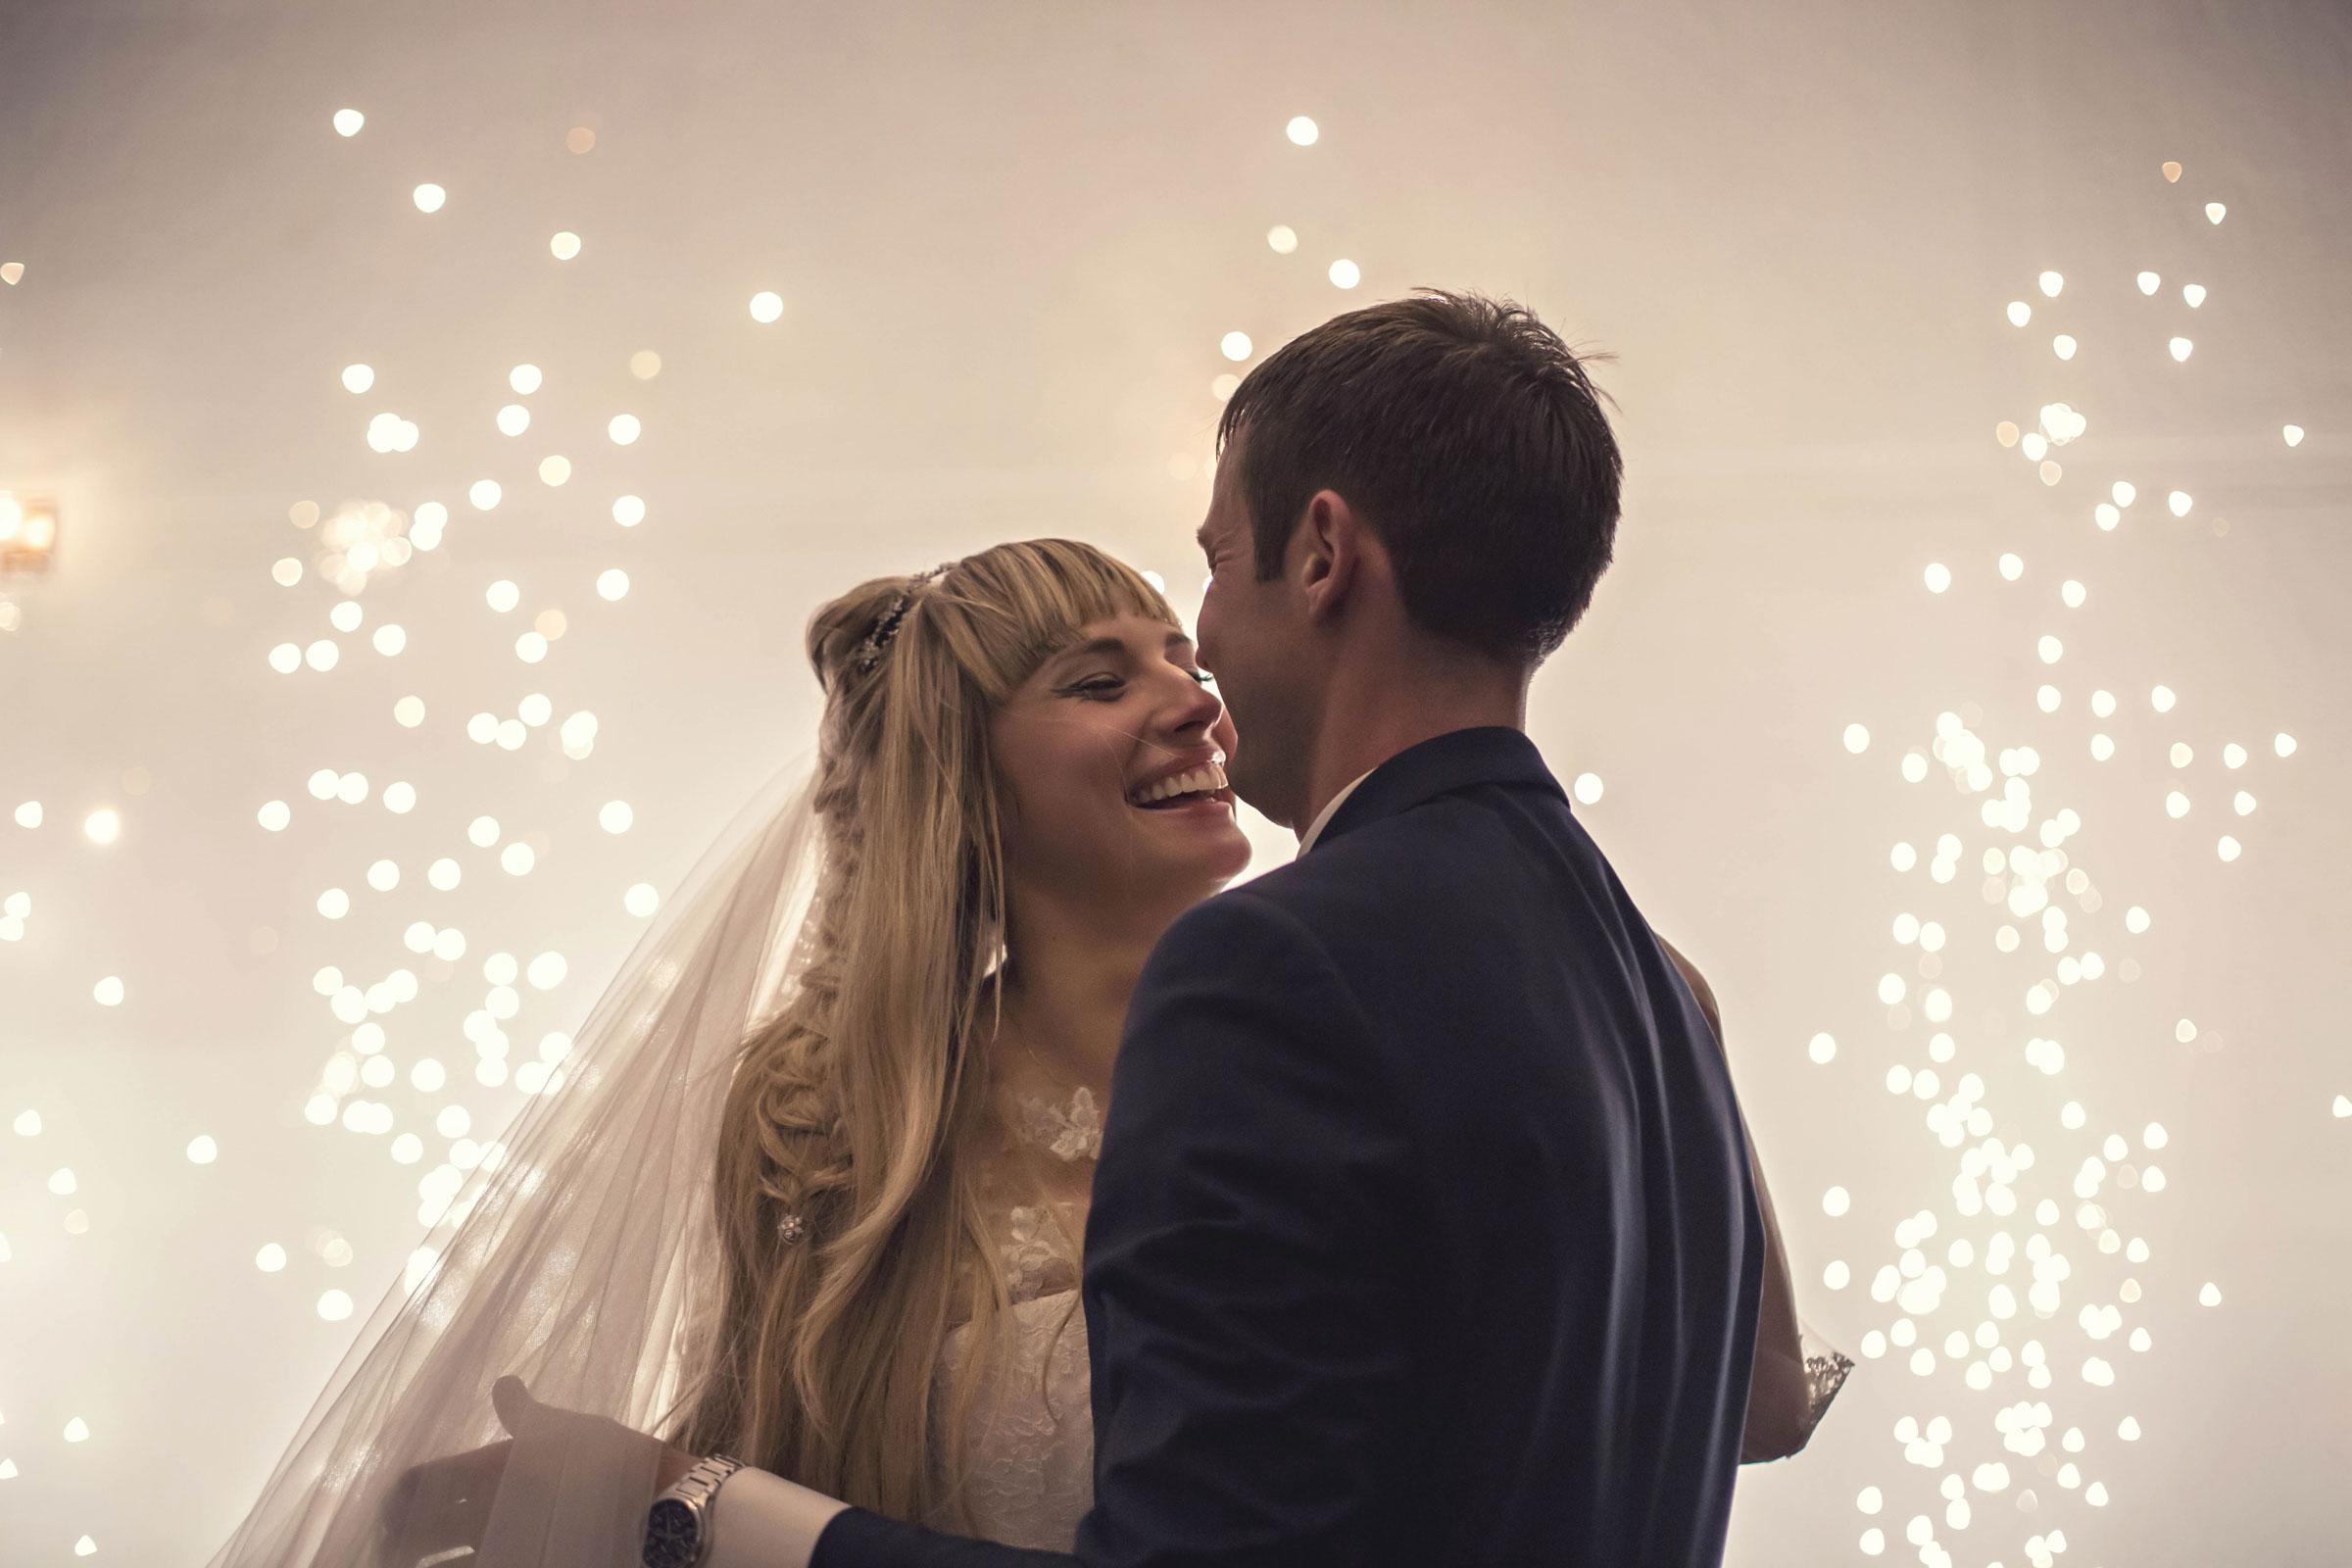 30 Romantic First Dance Wedding Songs - Toledo Wedding Guide